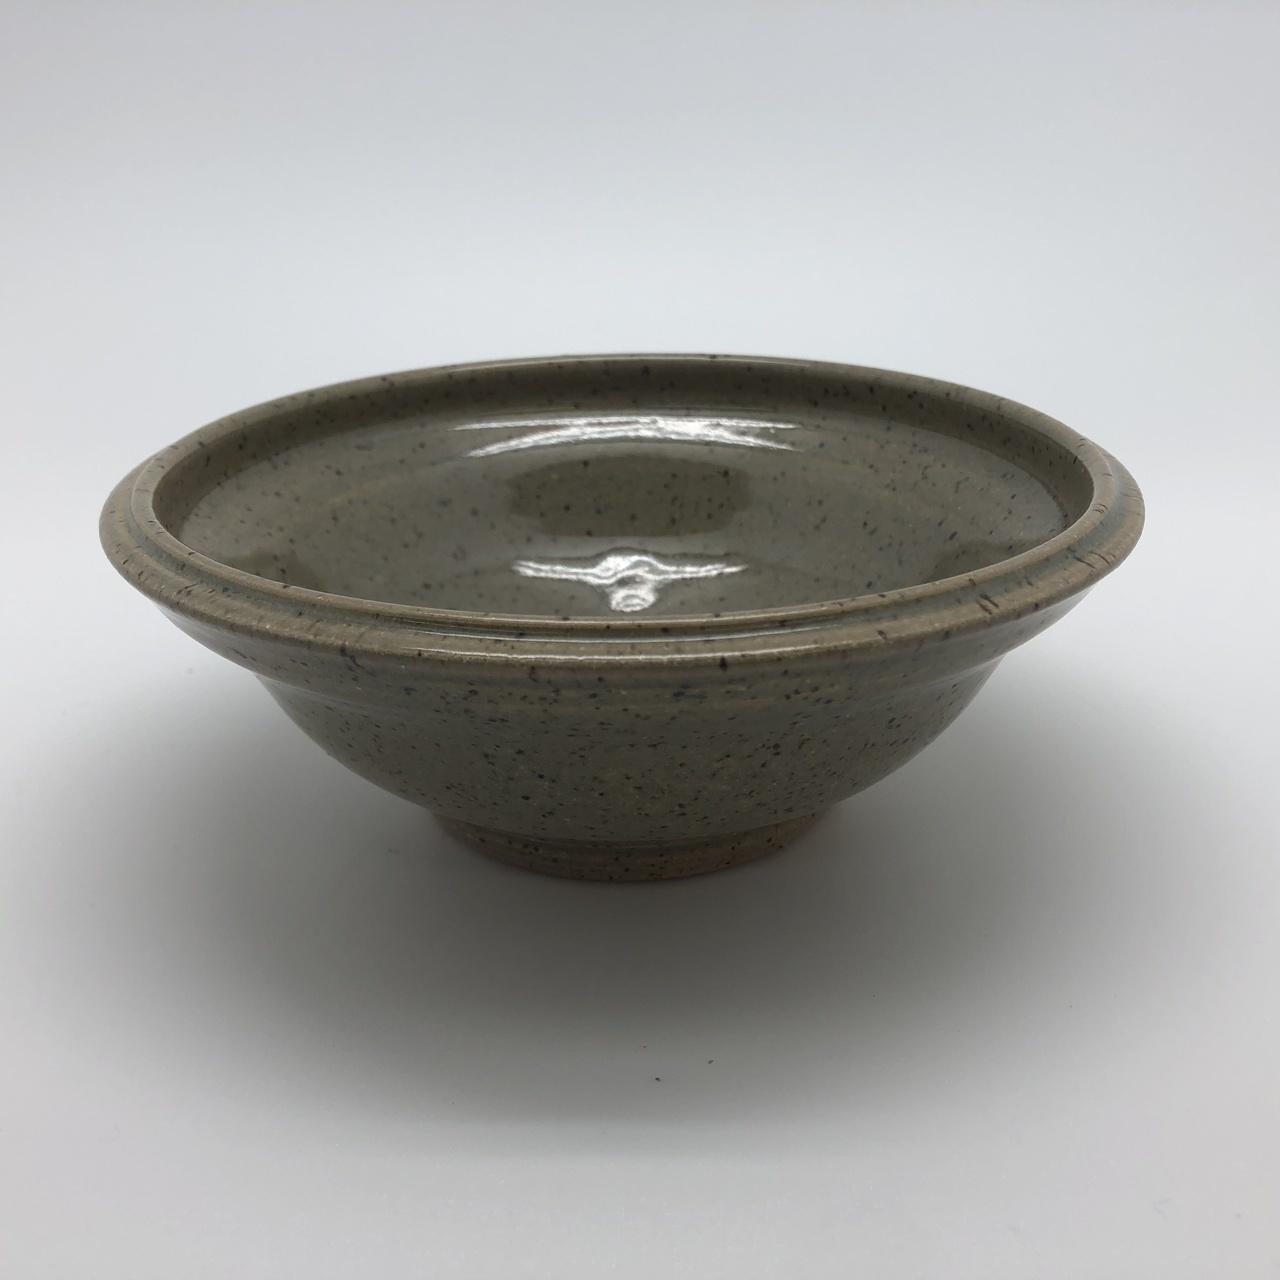 Khaki Speckled Clay Bowl